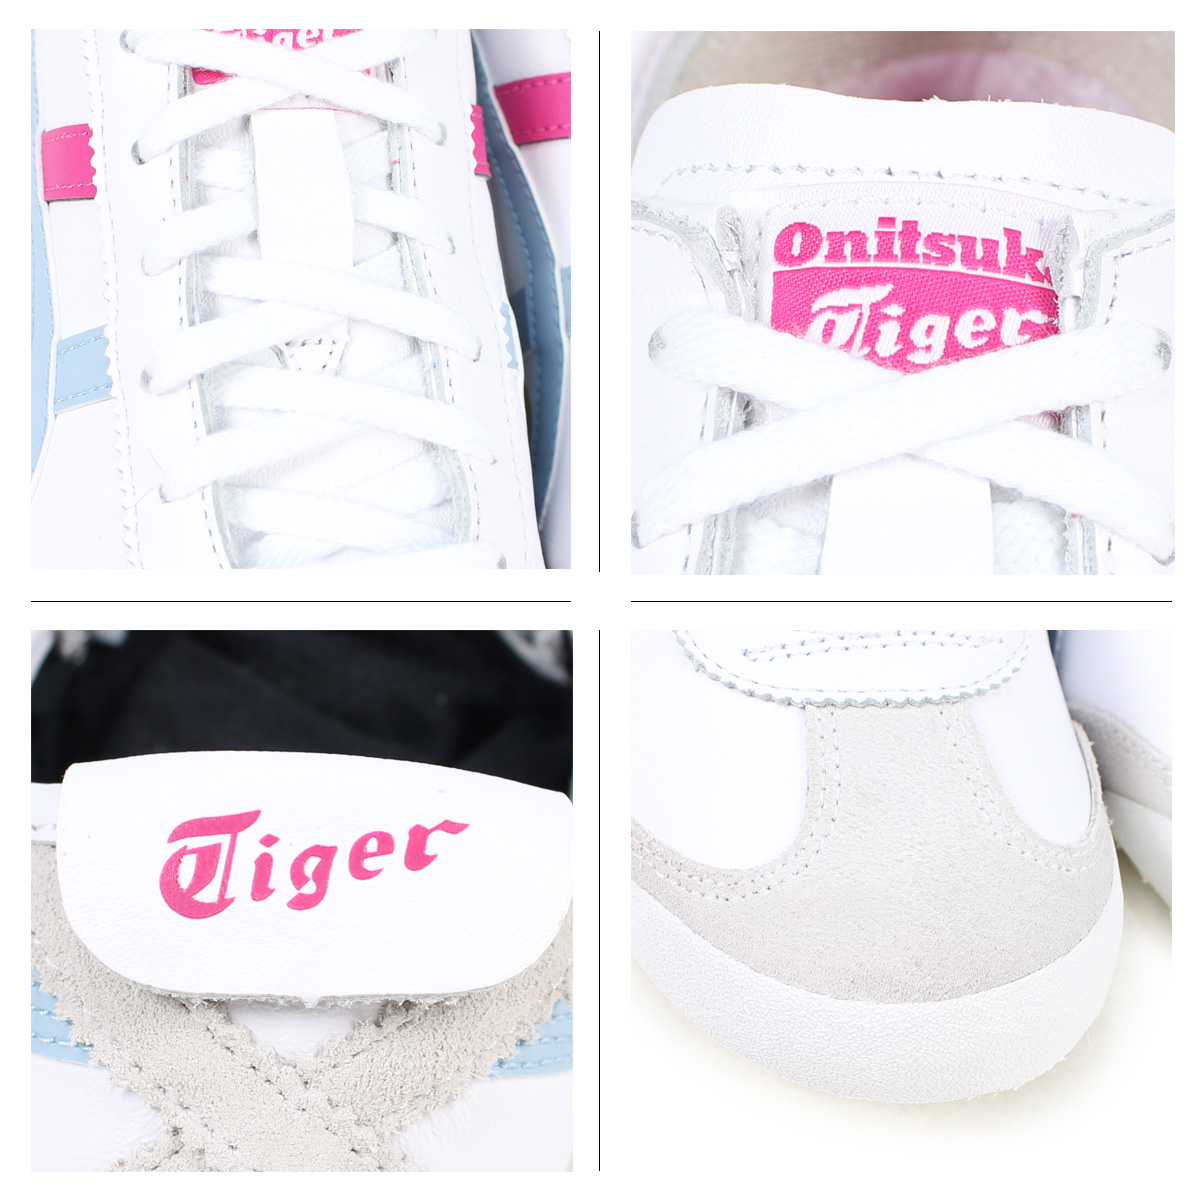 3740f97d5f ... Onitsuka Tiger Mexico 66 Onitsuka tiger MEXICO 66 men's lady's sneakers  D4J2L-0140 TH4J2L- ...